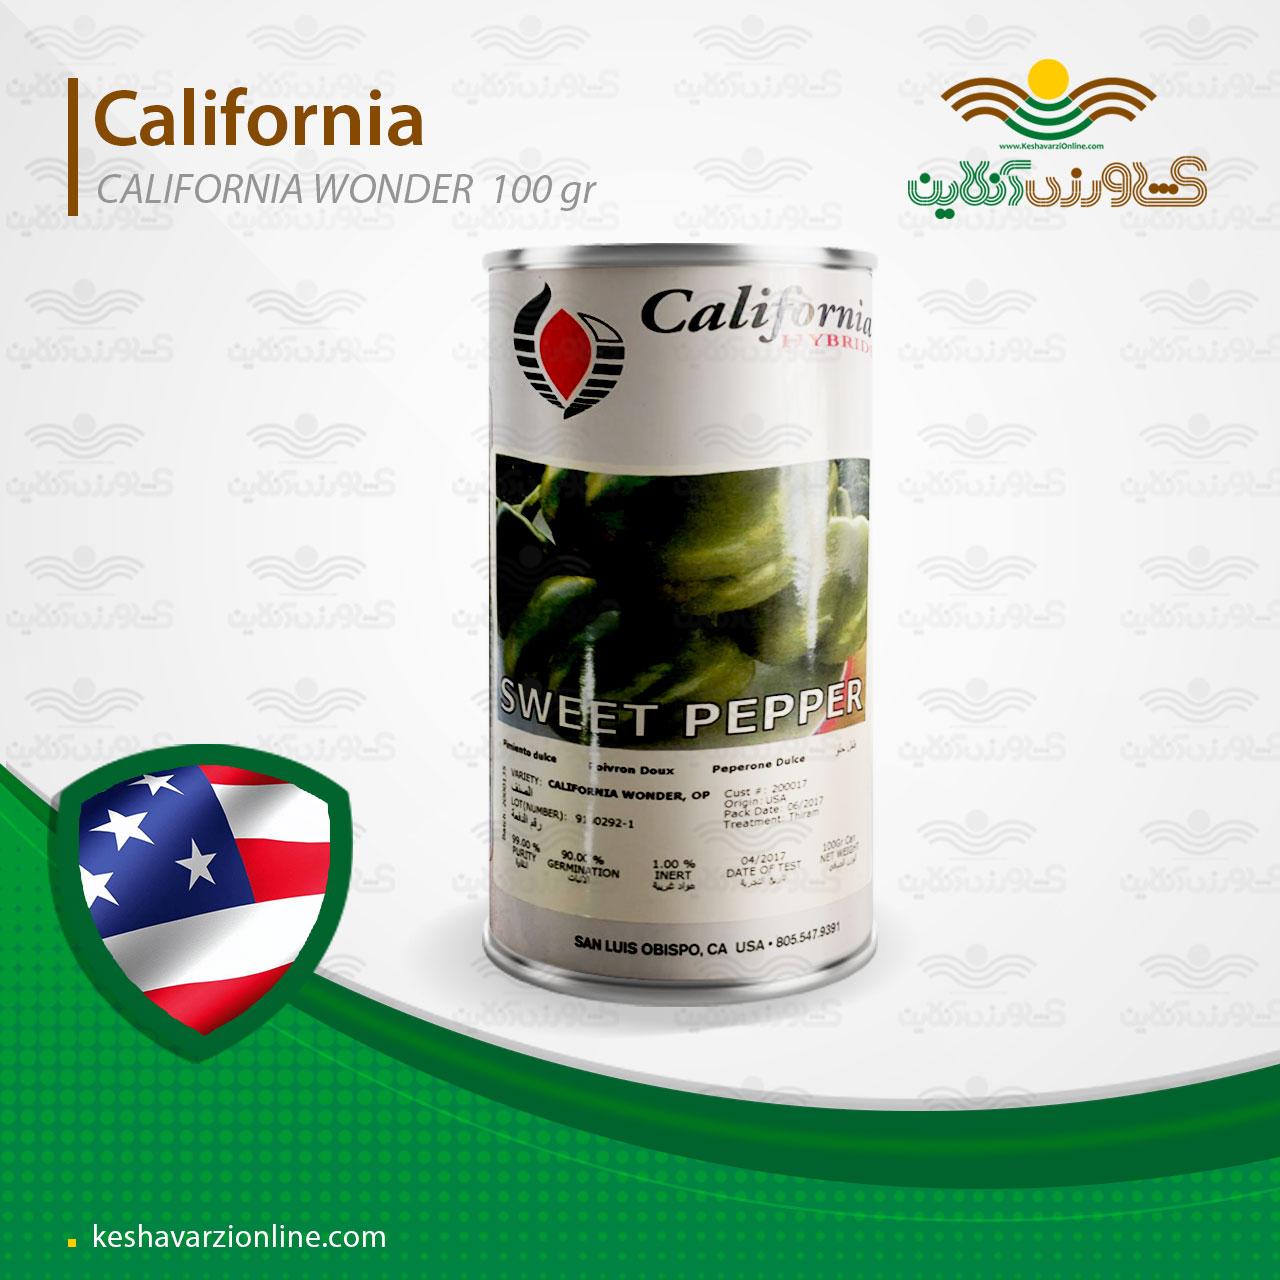 بذر فلفل دلمه ای کالیفرنیا هلندی